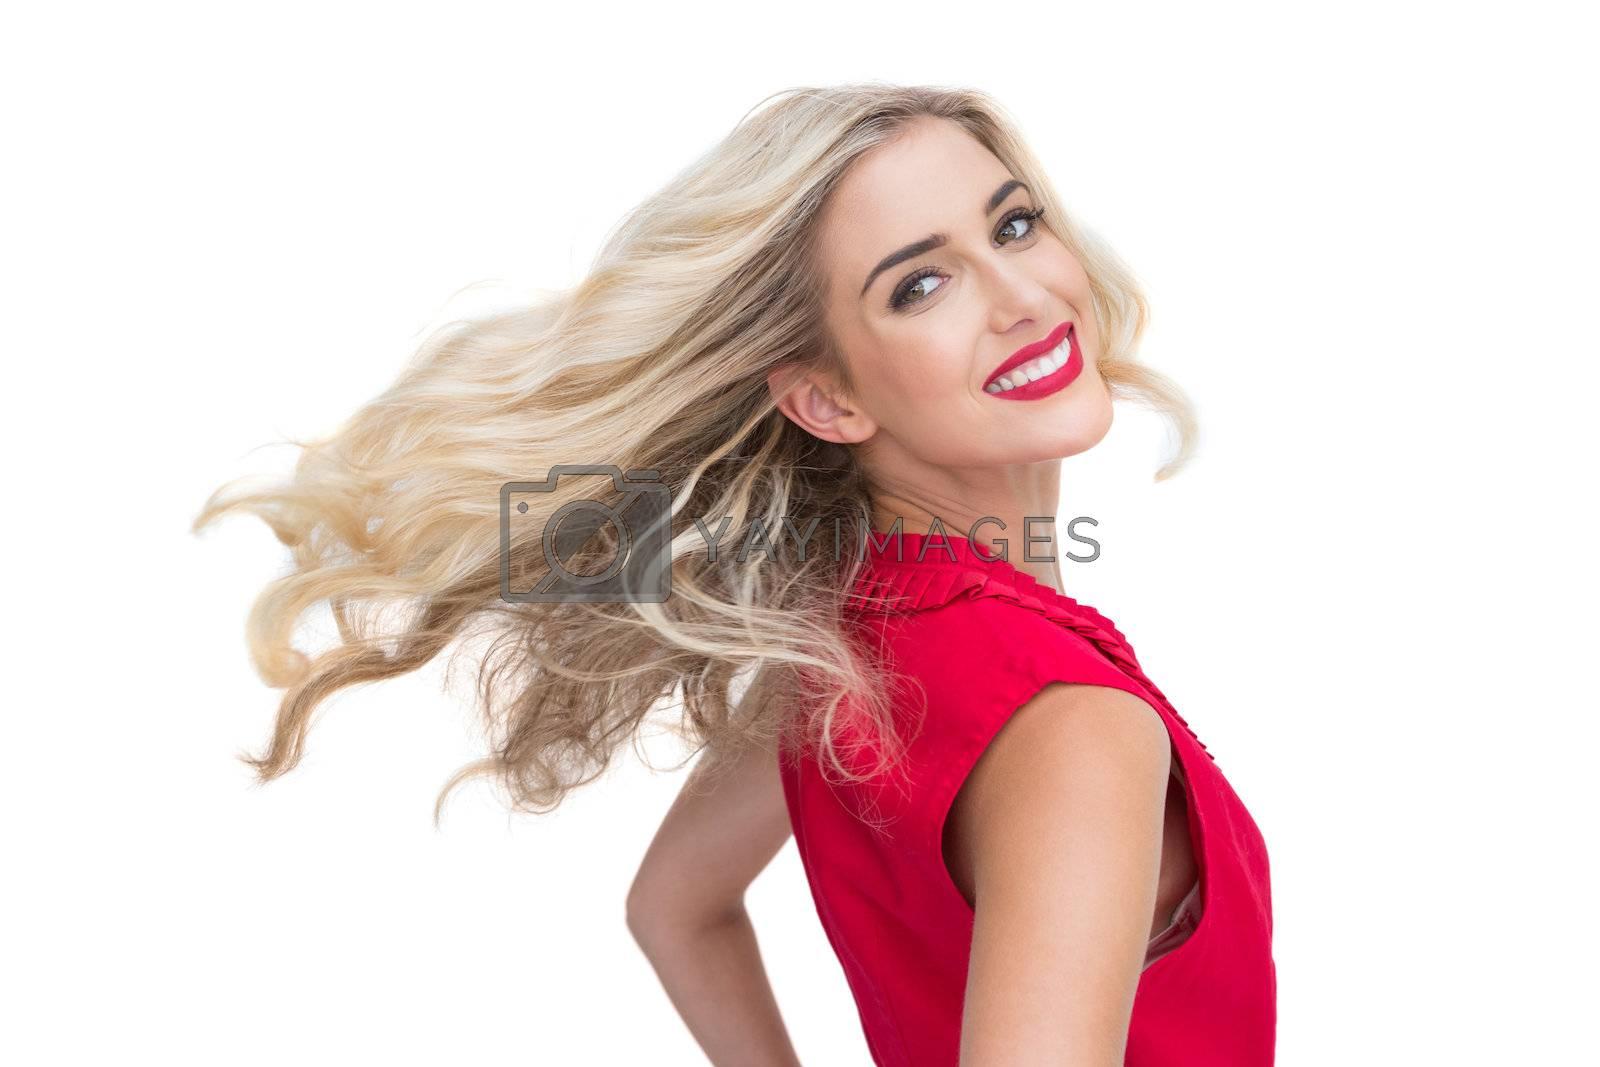 Smiling glamorous blonde posing by Wavebreakmedia